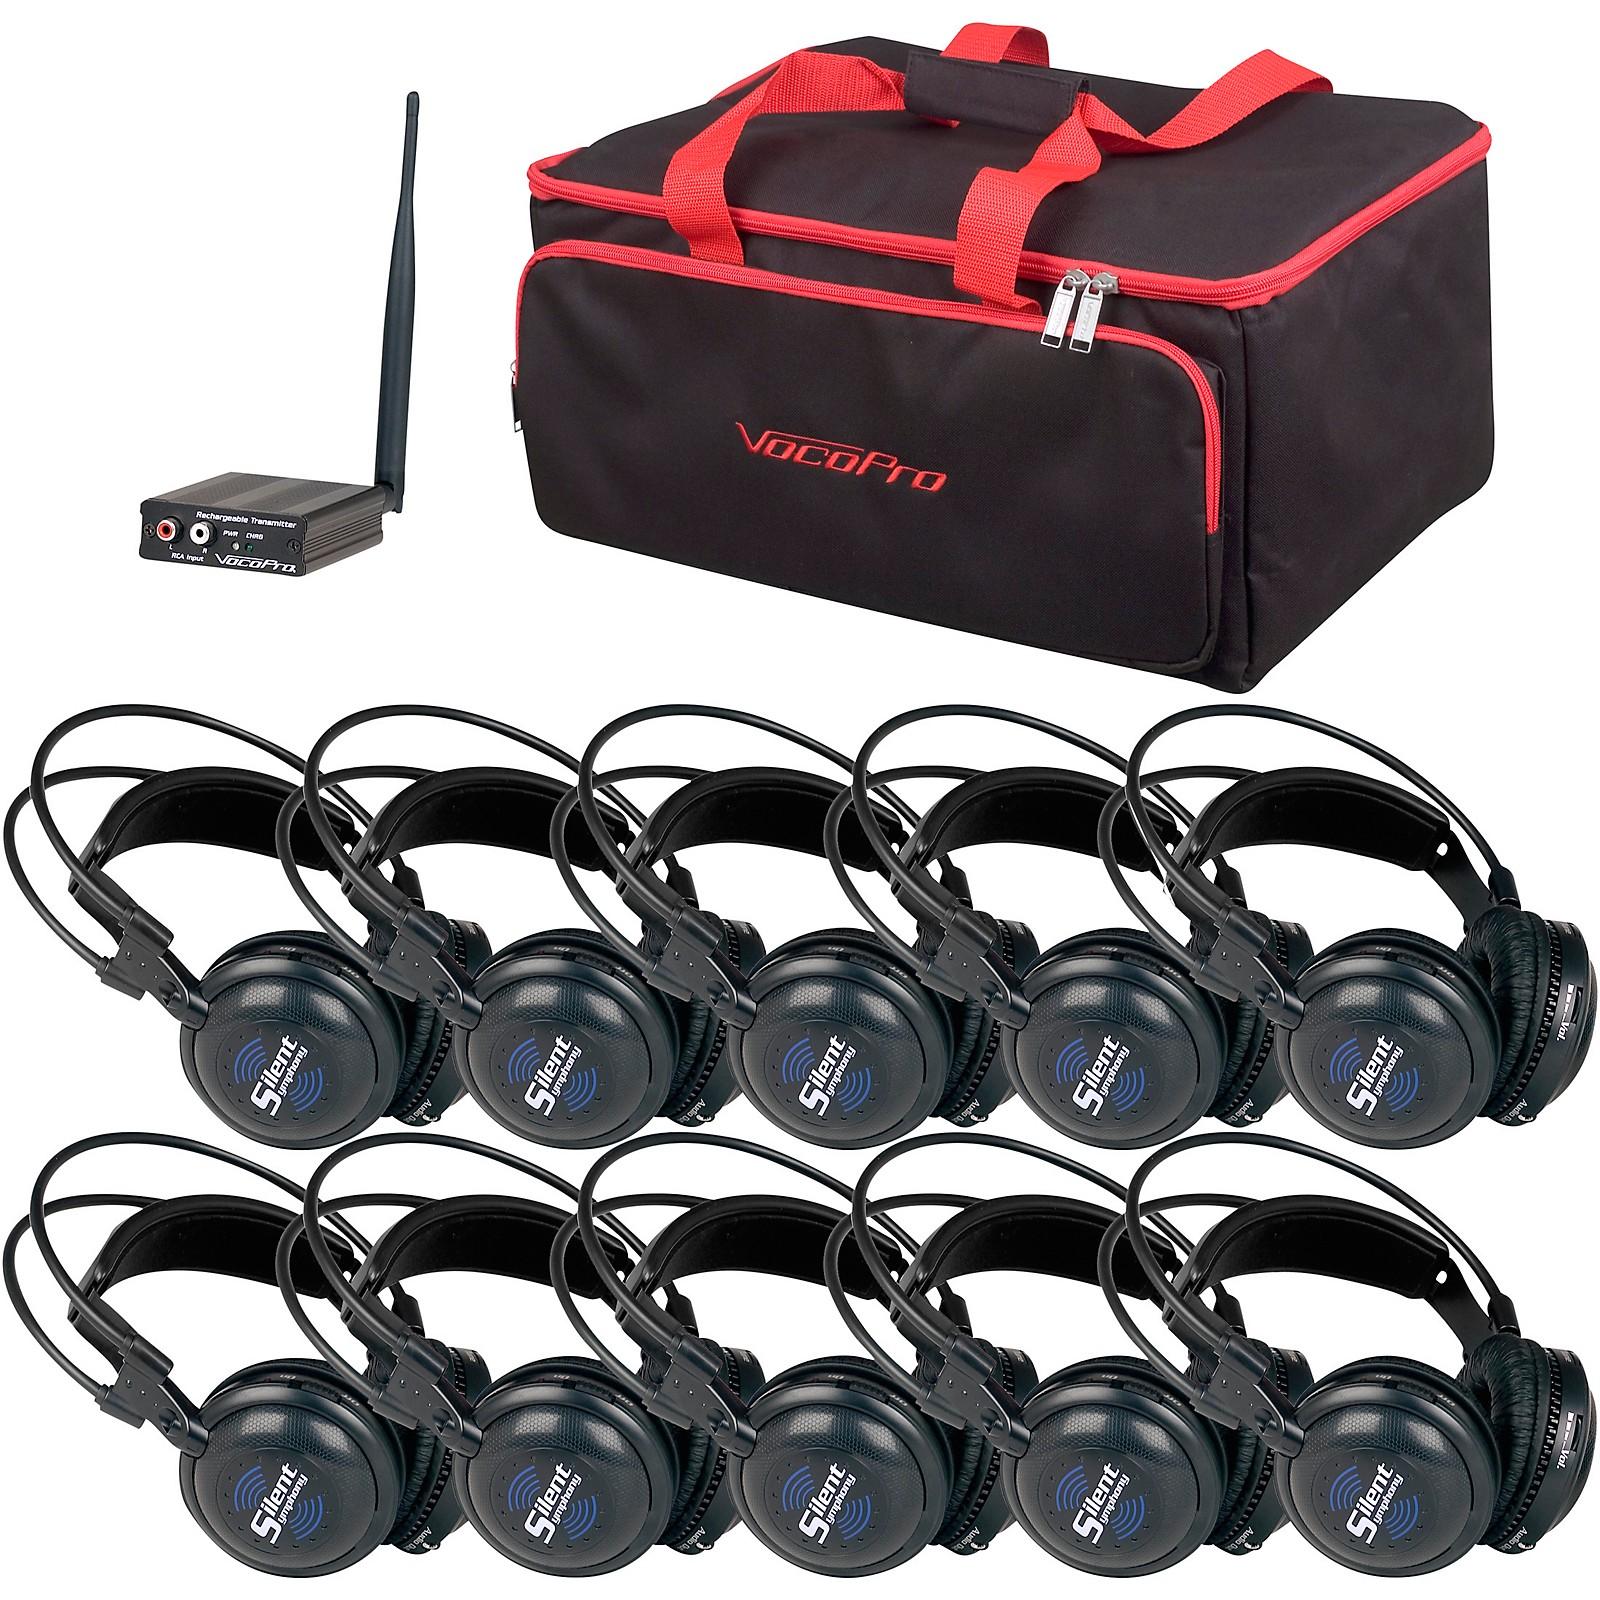 Open Box VocoPro SilentSymphony-Learn 10 Station Stereo Wireless Listening Center